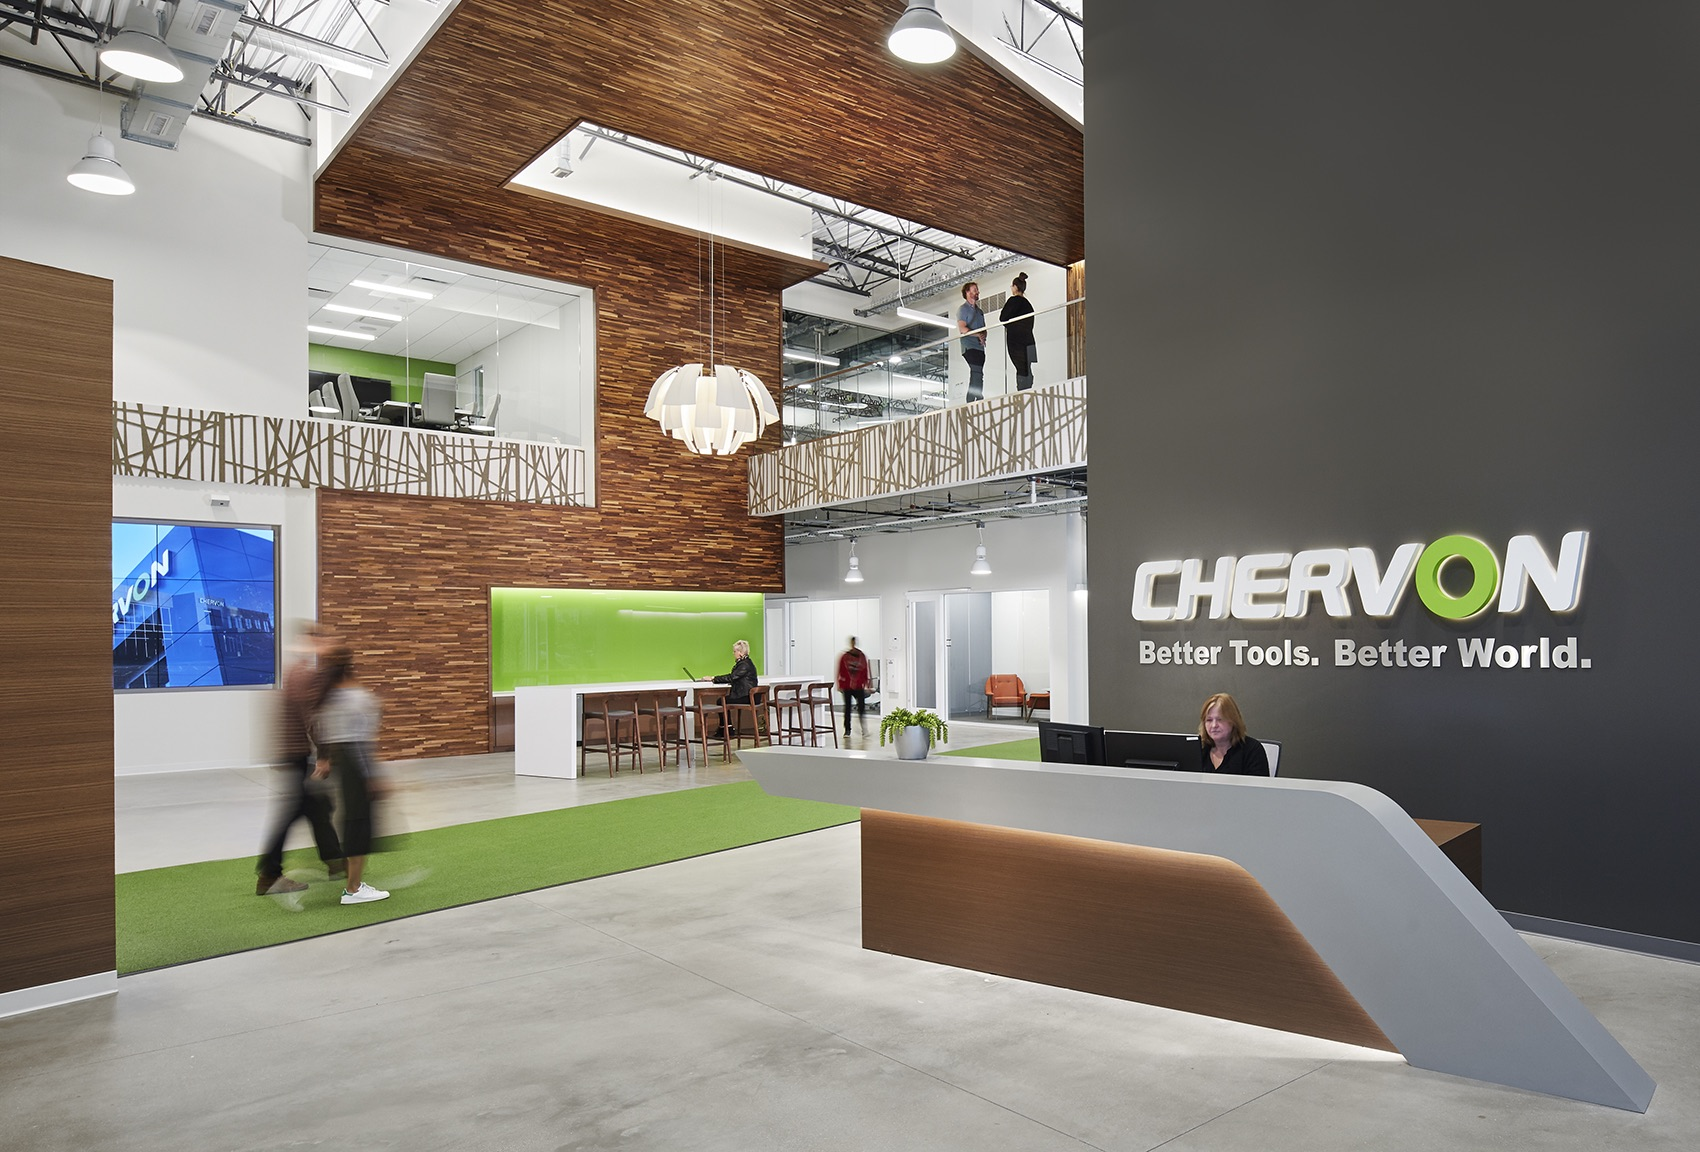 chevron-us-hq-office-1